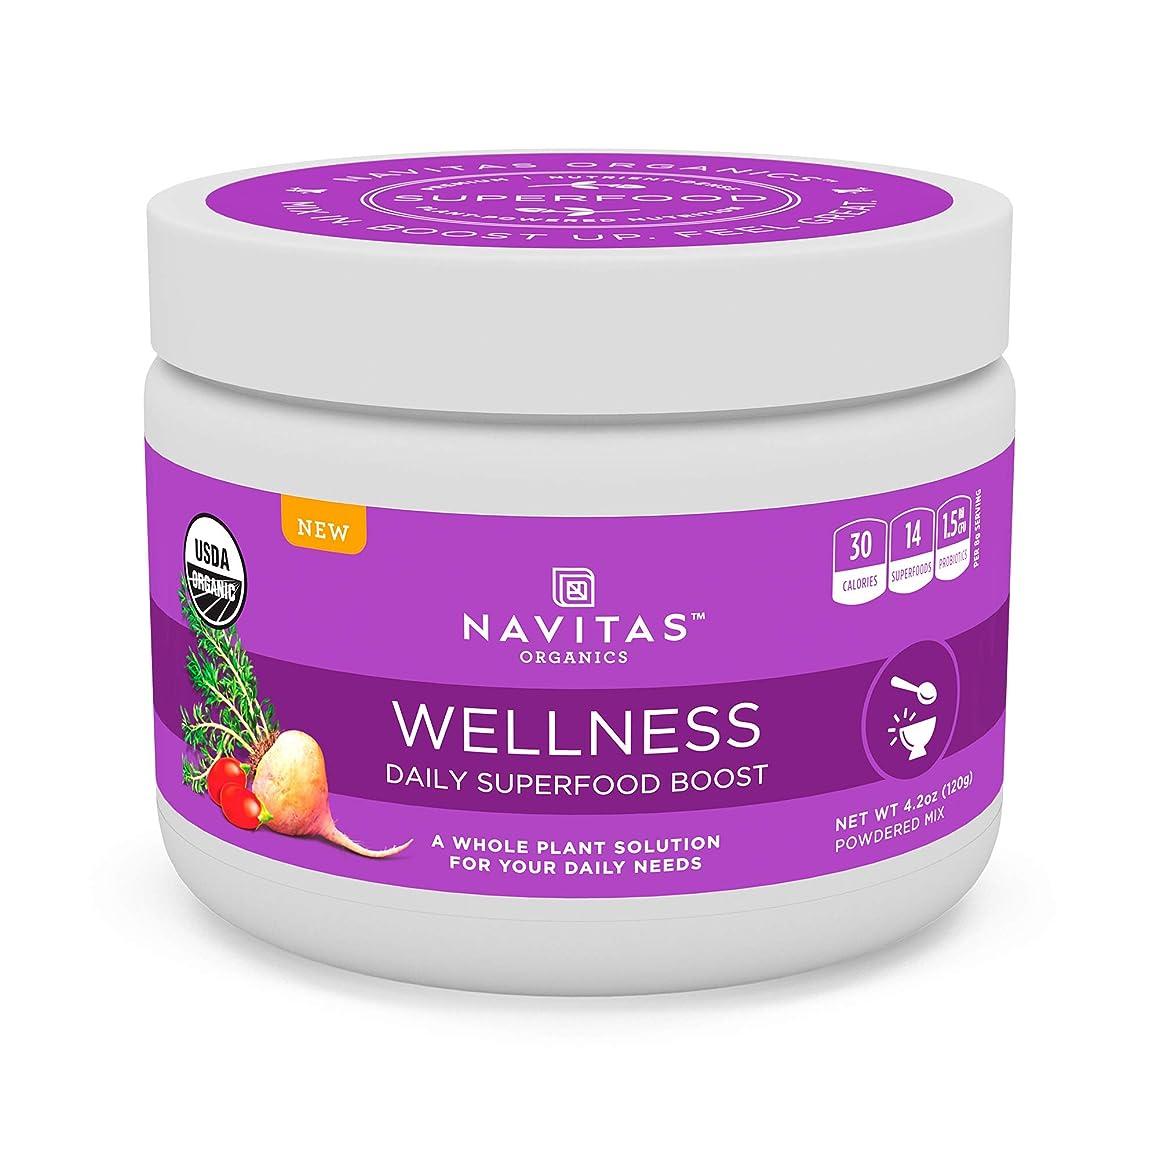 Navitas Organics Daily Superfood Boost, Wellness, 4.2 Ounce